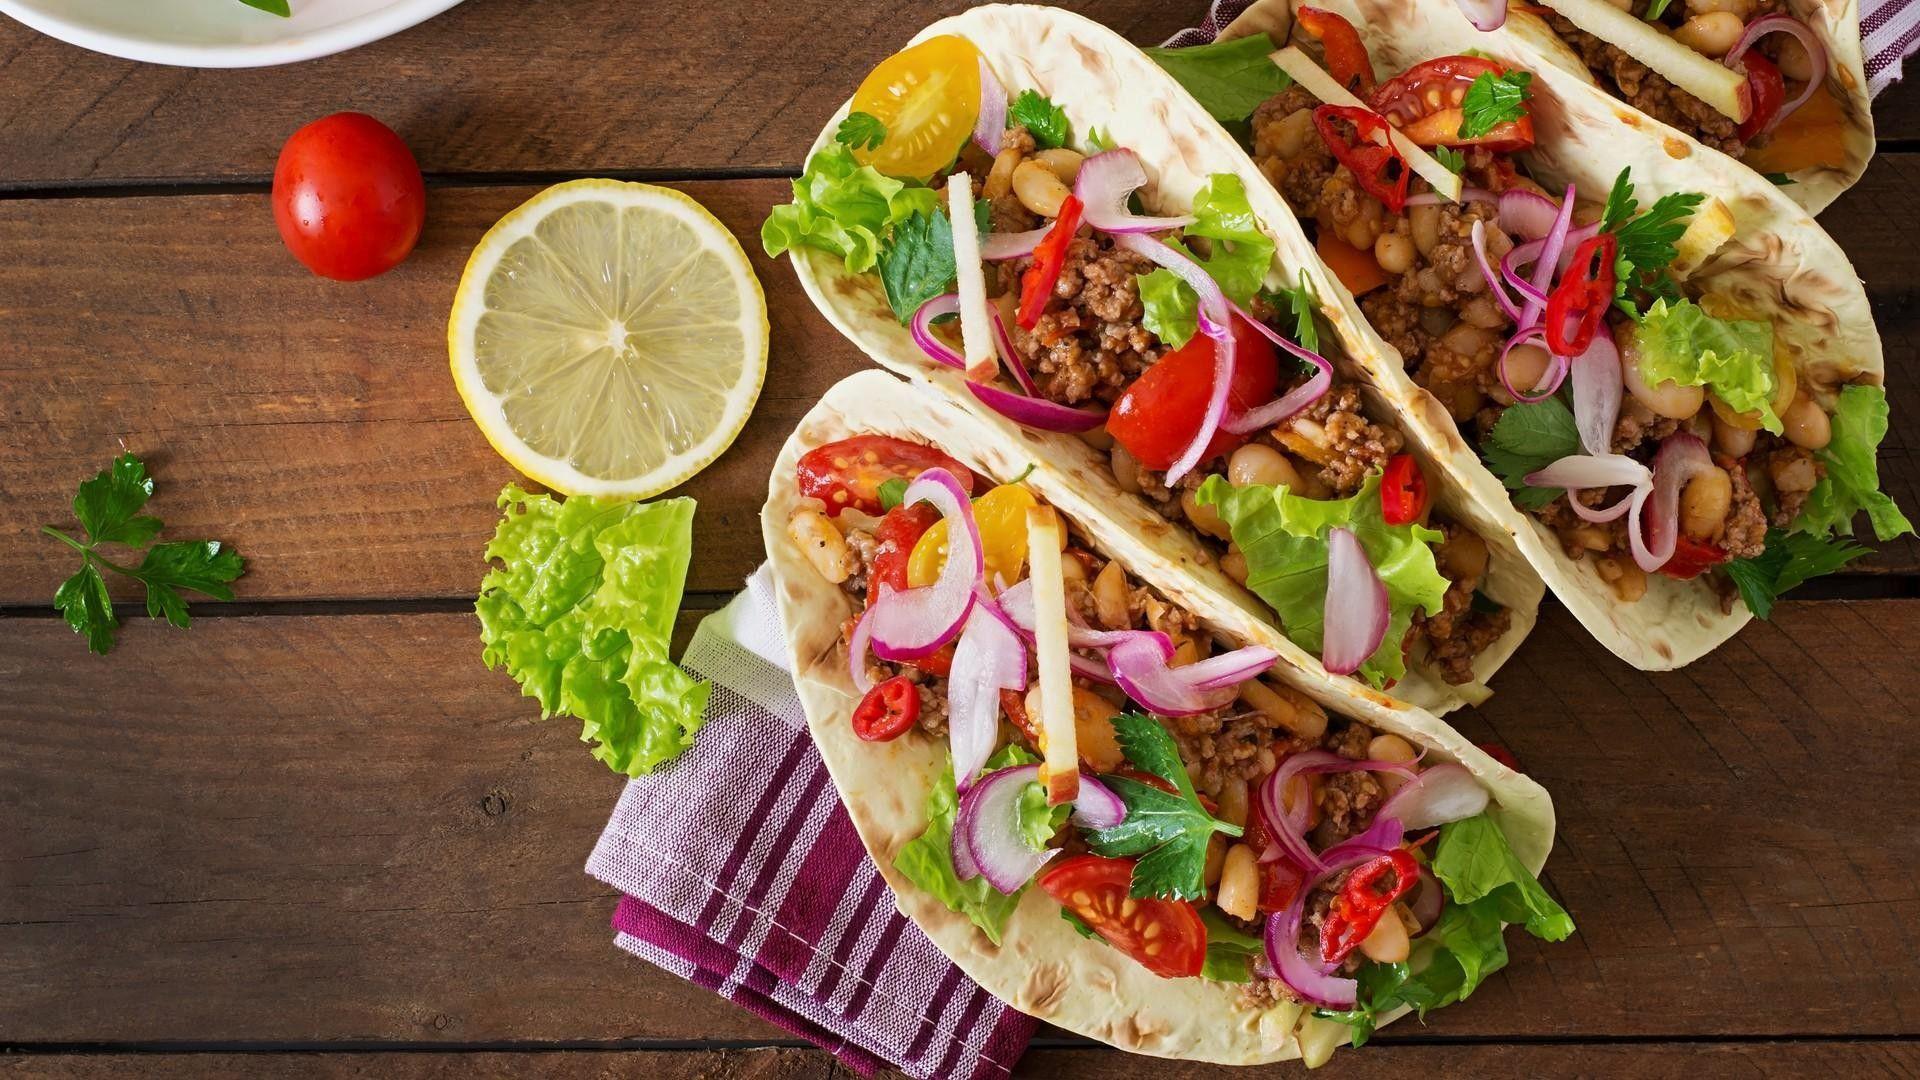 Mexican Food Desktop Wallpapers Top Free Mexican Food Desktop Backgrounds Wallpaperaccess